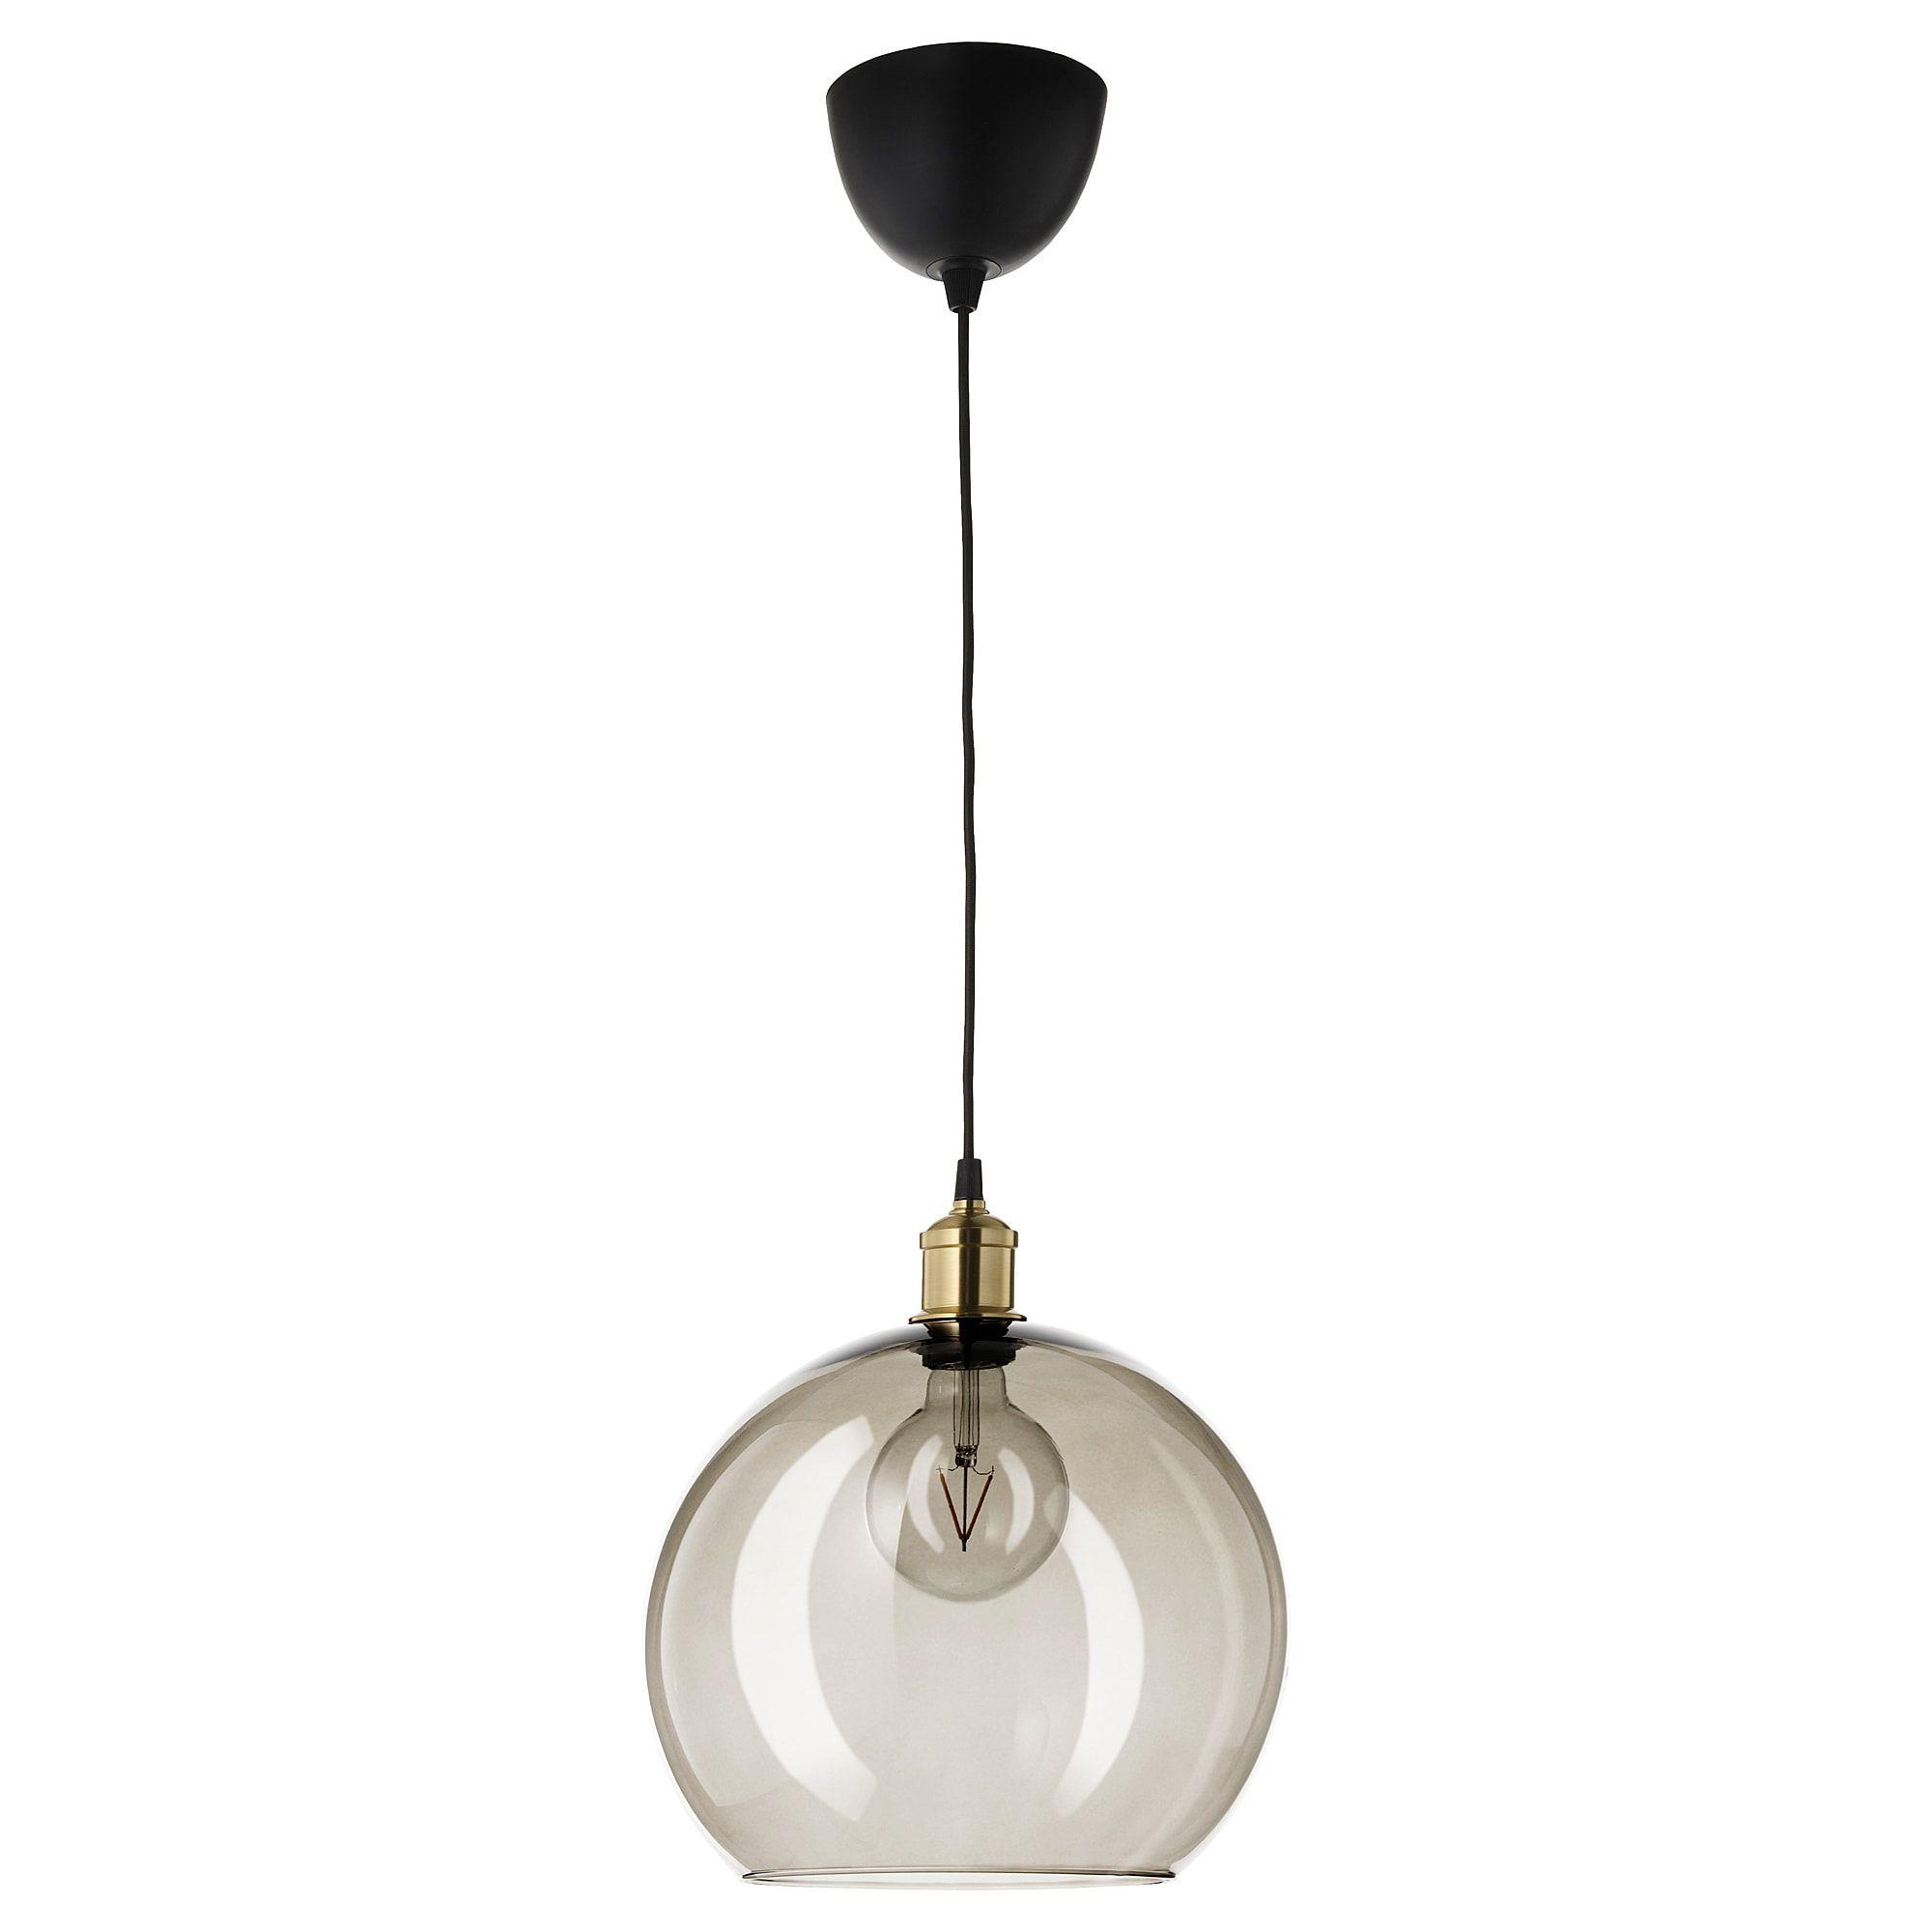 Smoked glass minimal pendant light